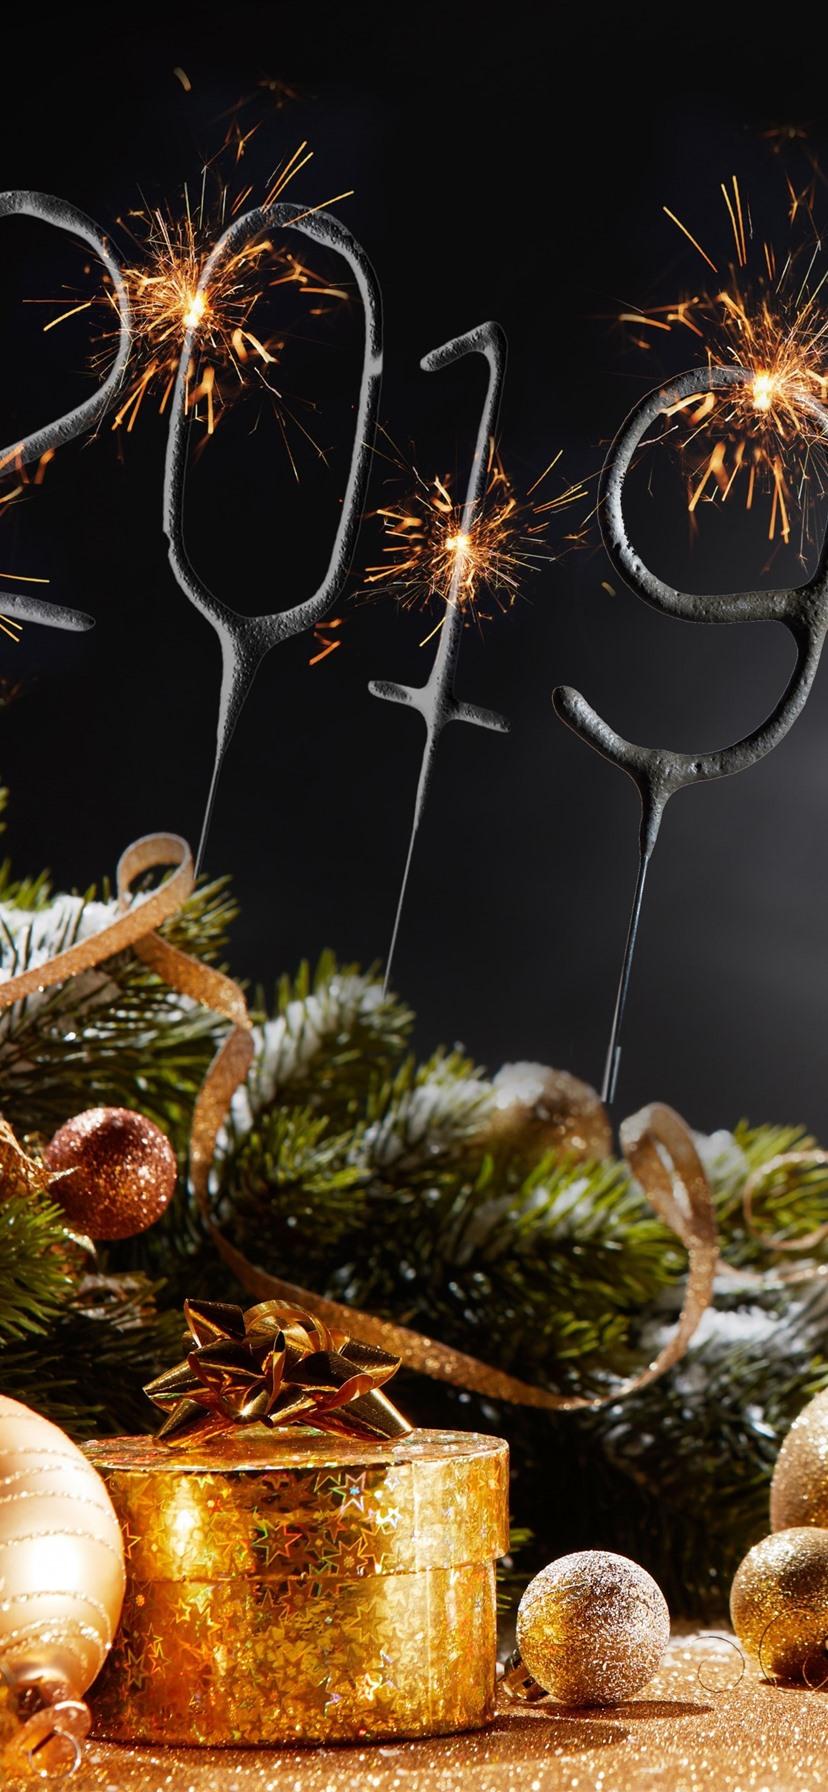 Wallpaper Happy New Year 2019 Christmas Balls Champagne